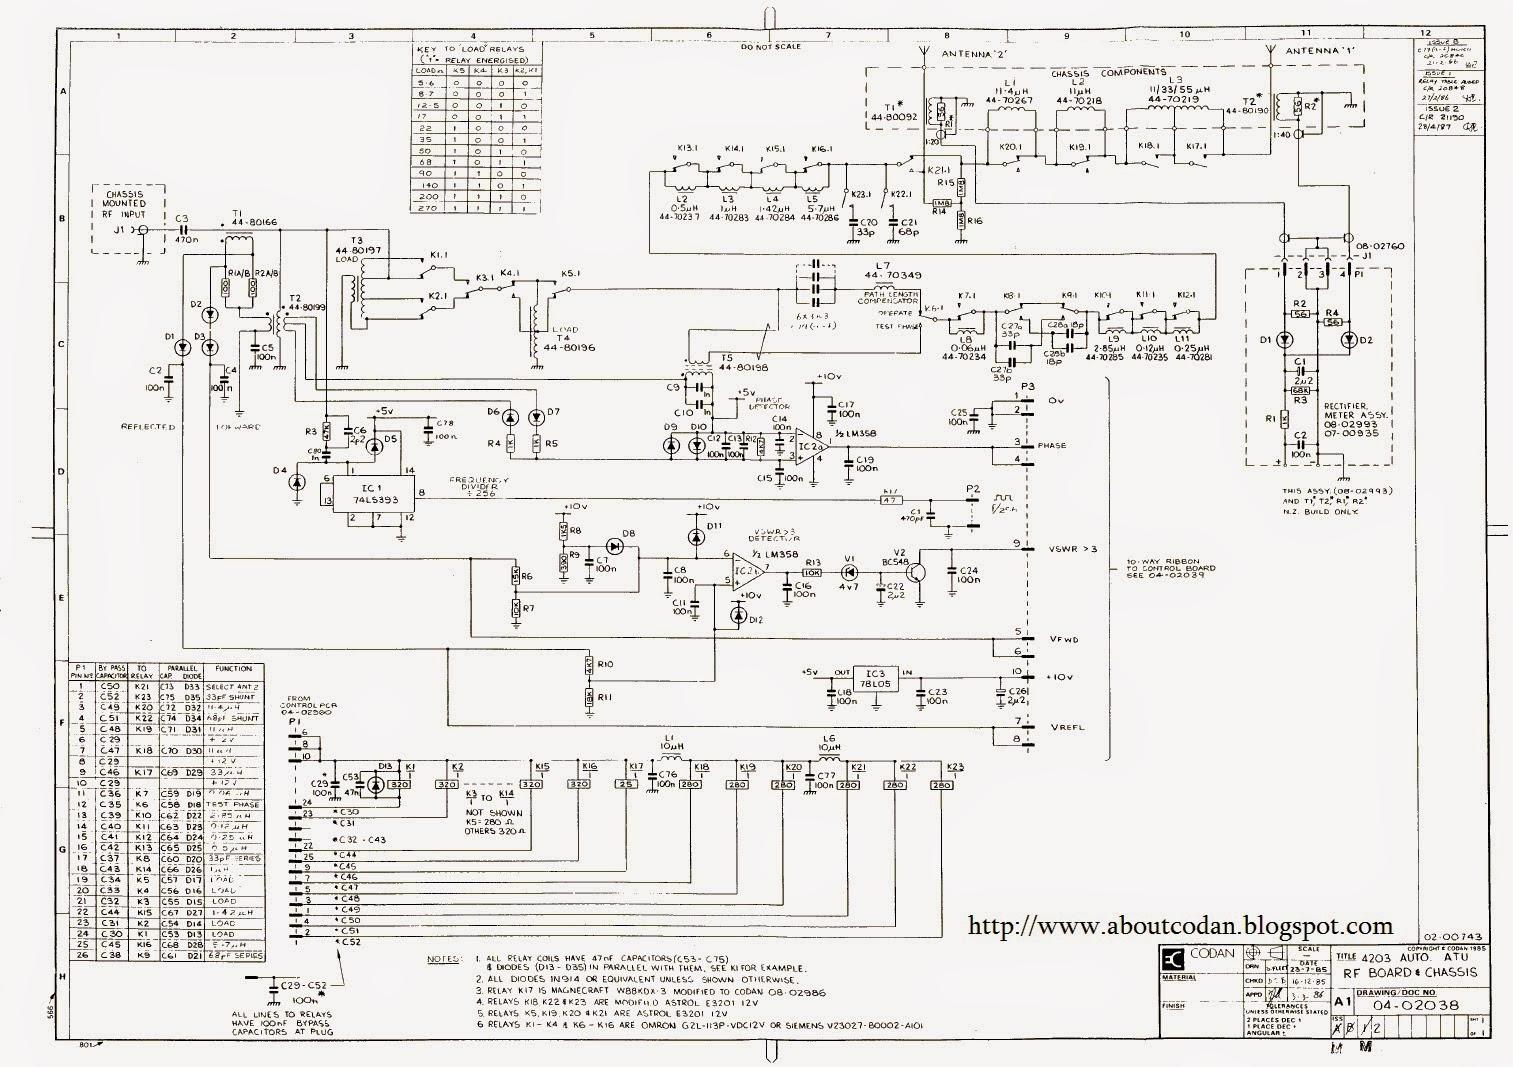 Everything about CODAN: Codan X2 (9105) Power Amplifier